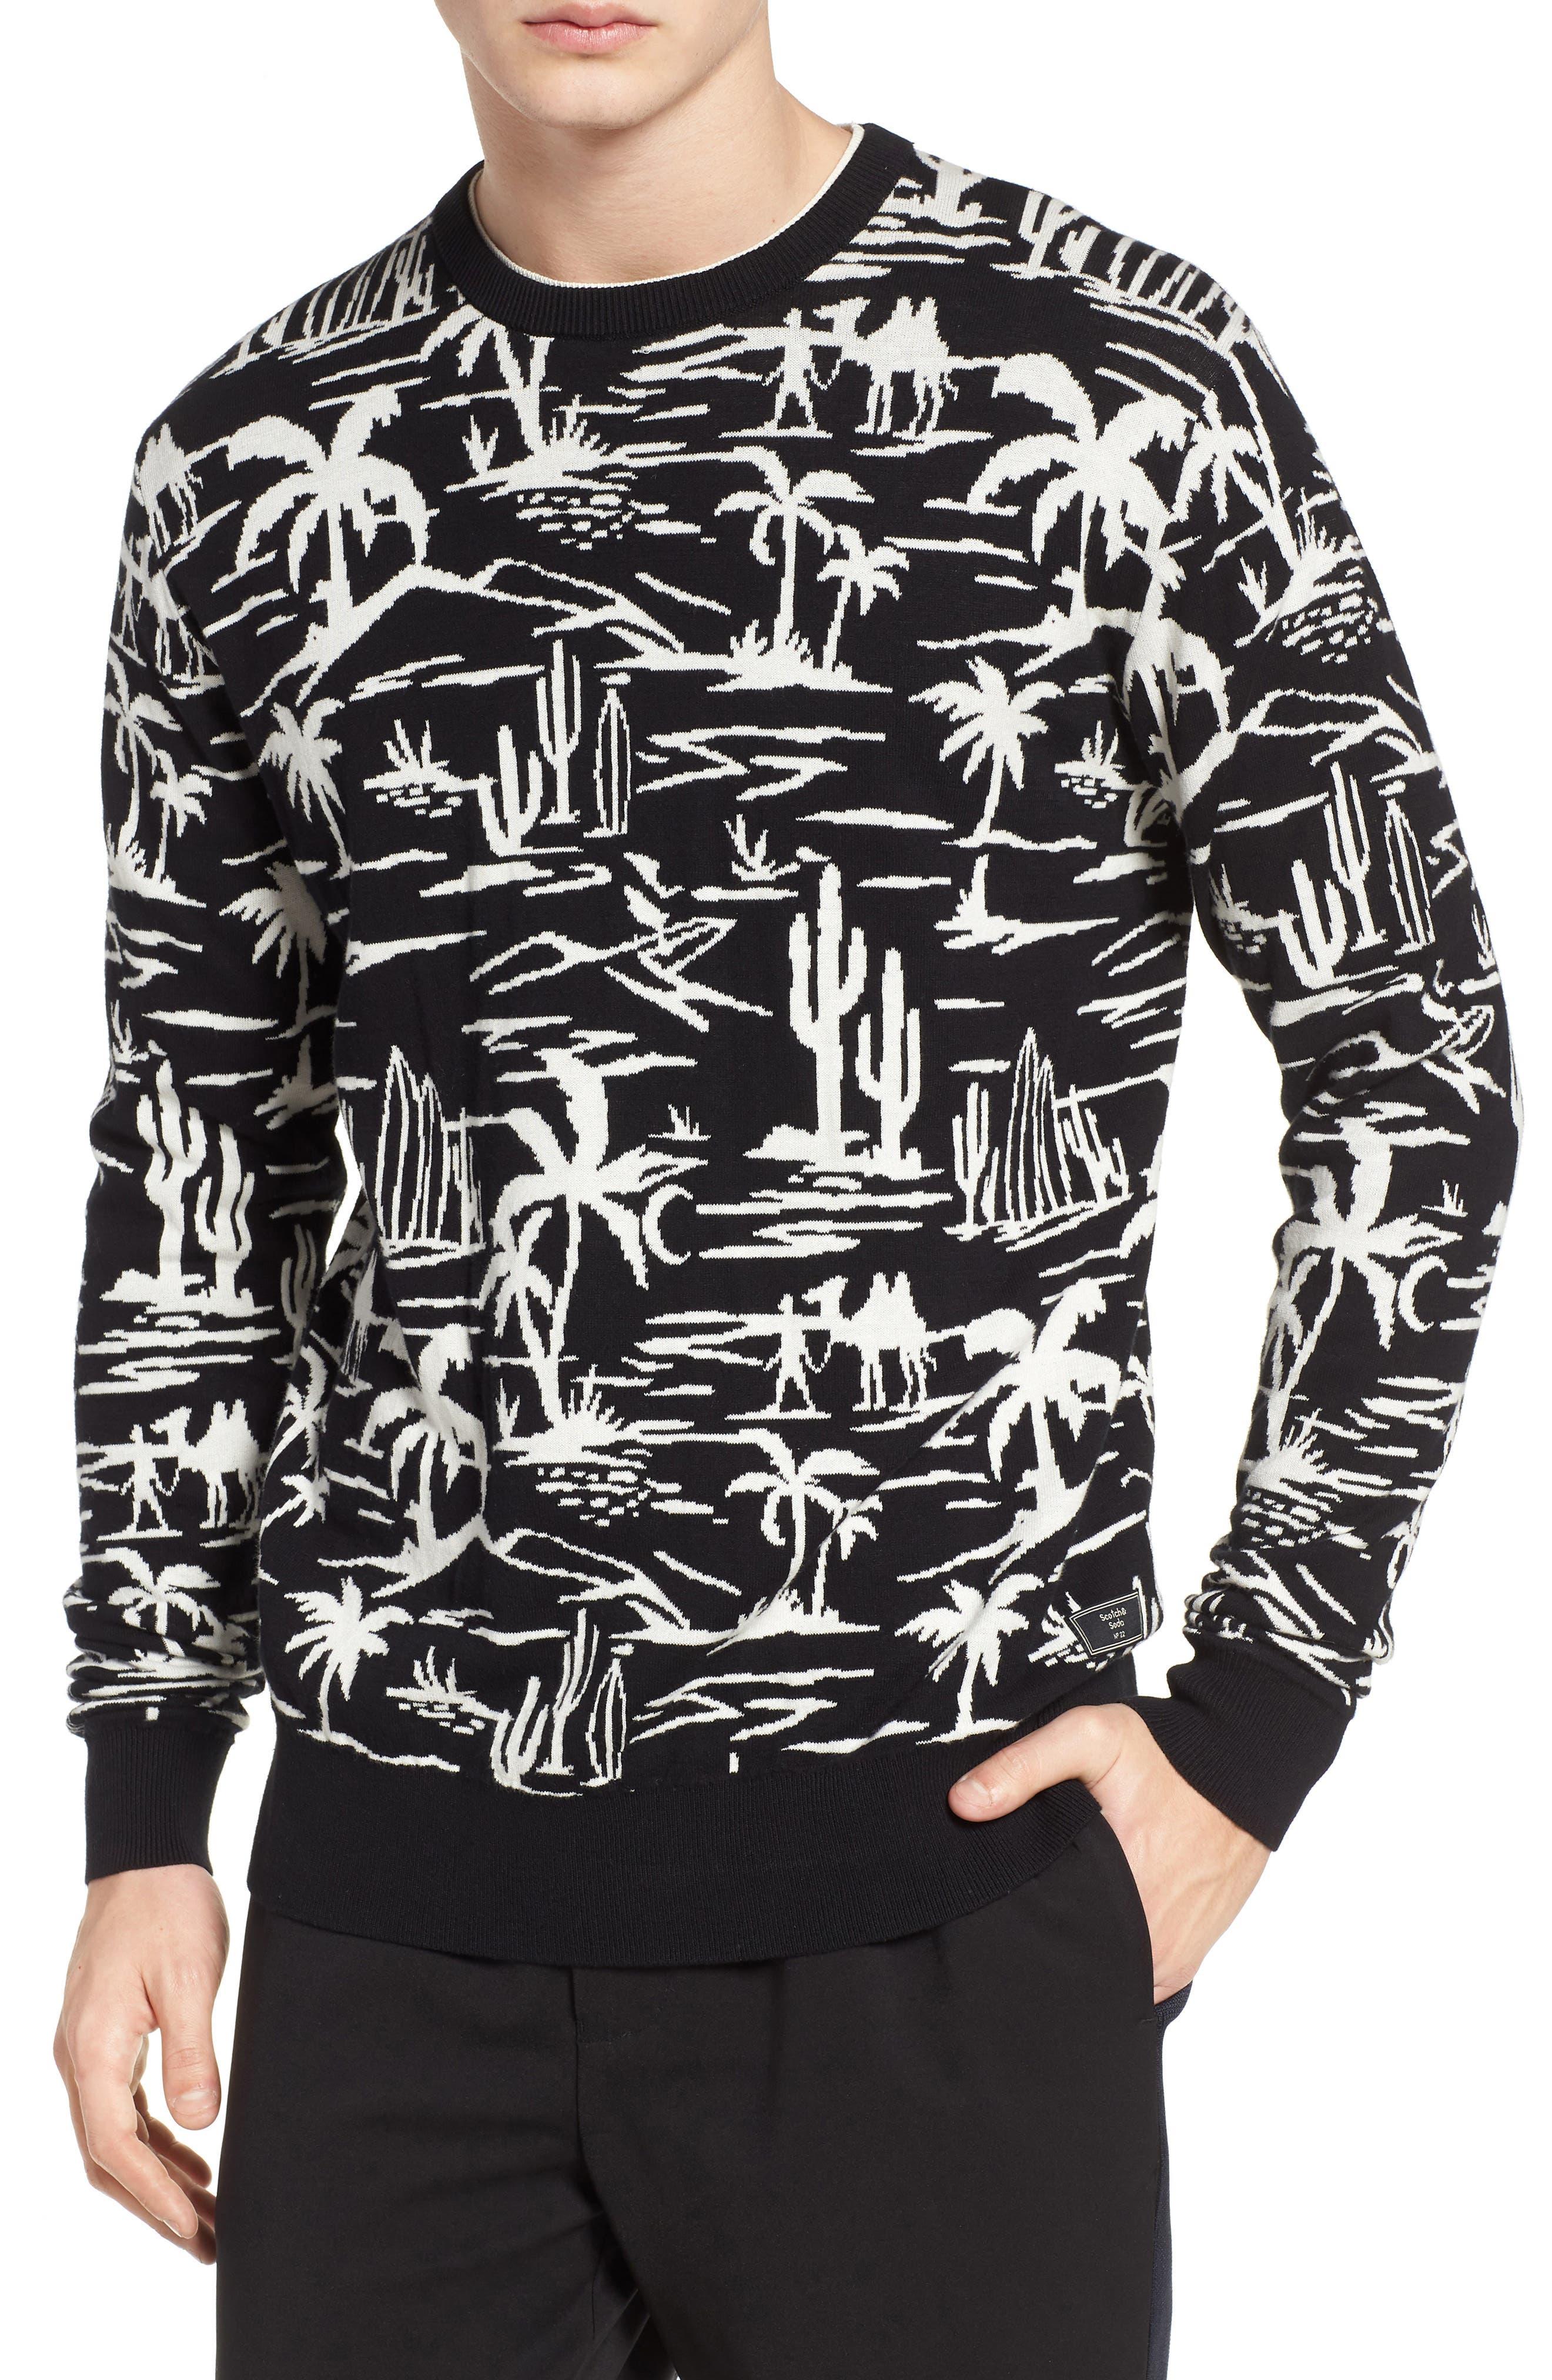 Jacquard Pattern Sweatshirt,                             Main thumbnail 1, color,                             Combo A